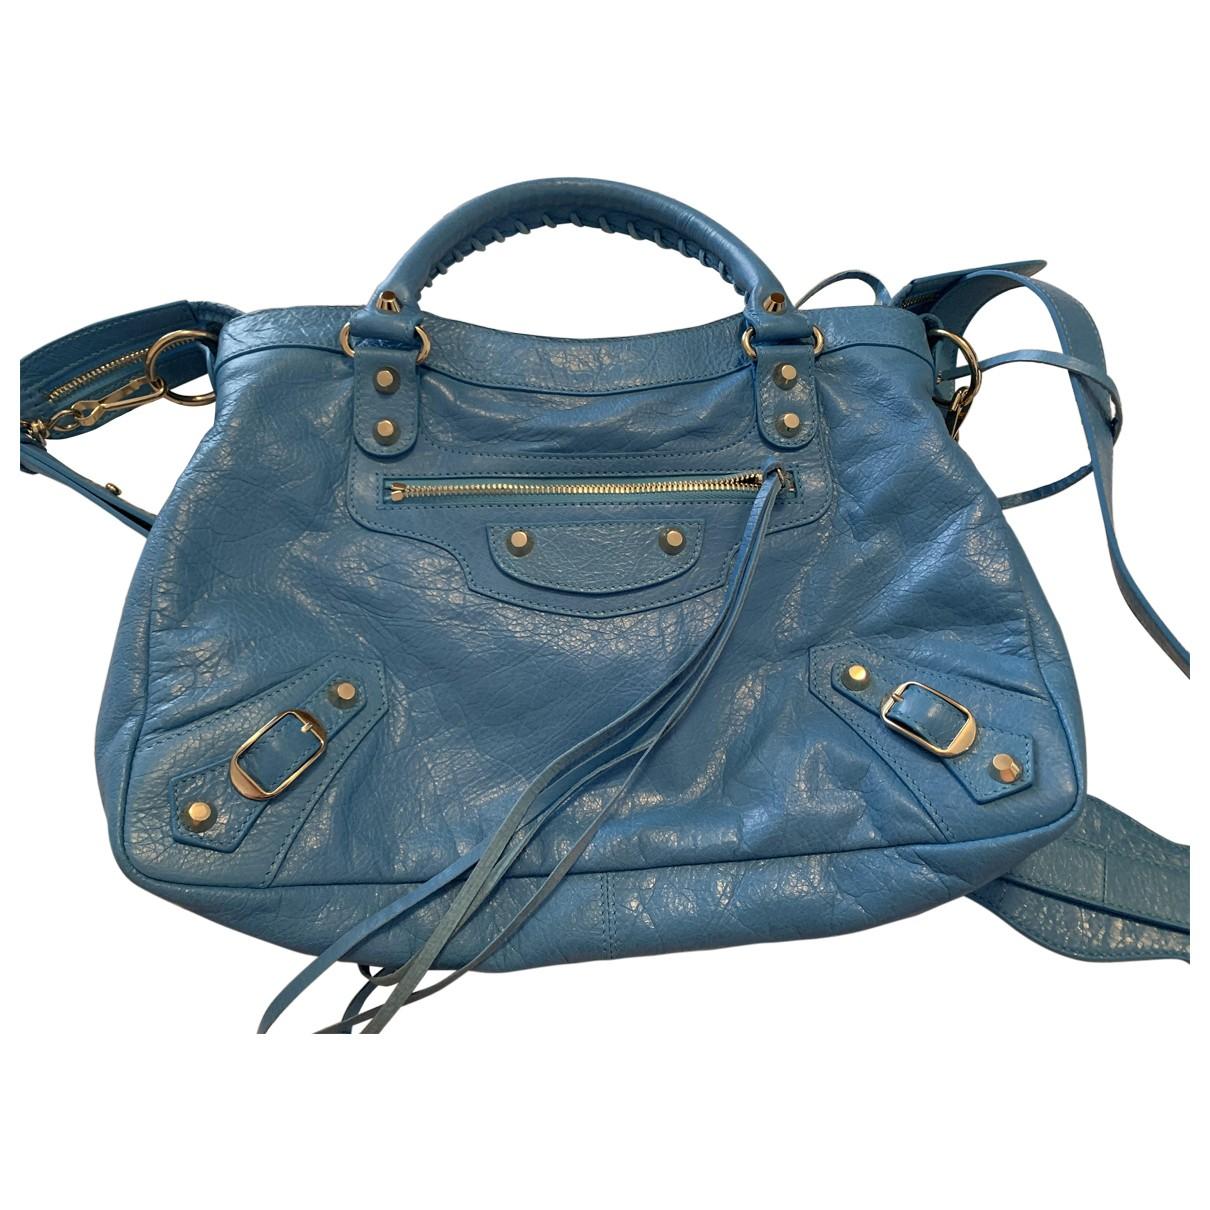 Balenciaga City Turquoise Leather handbag for Women \N